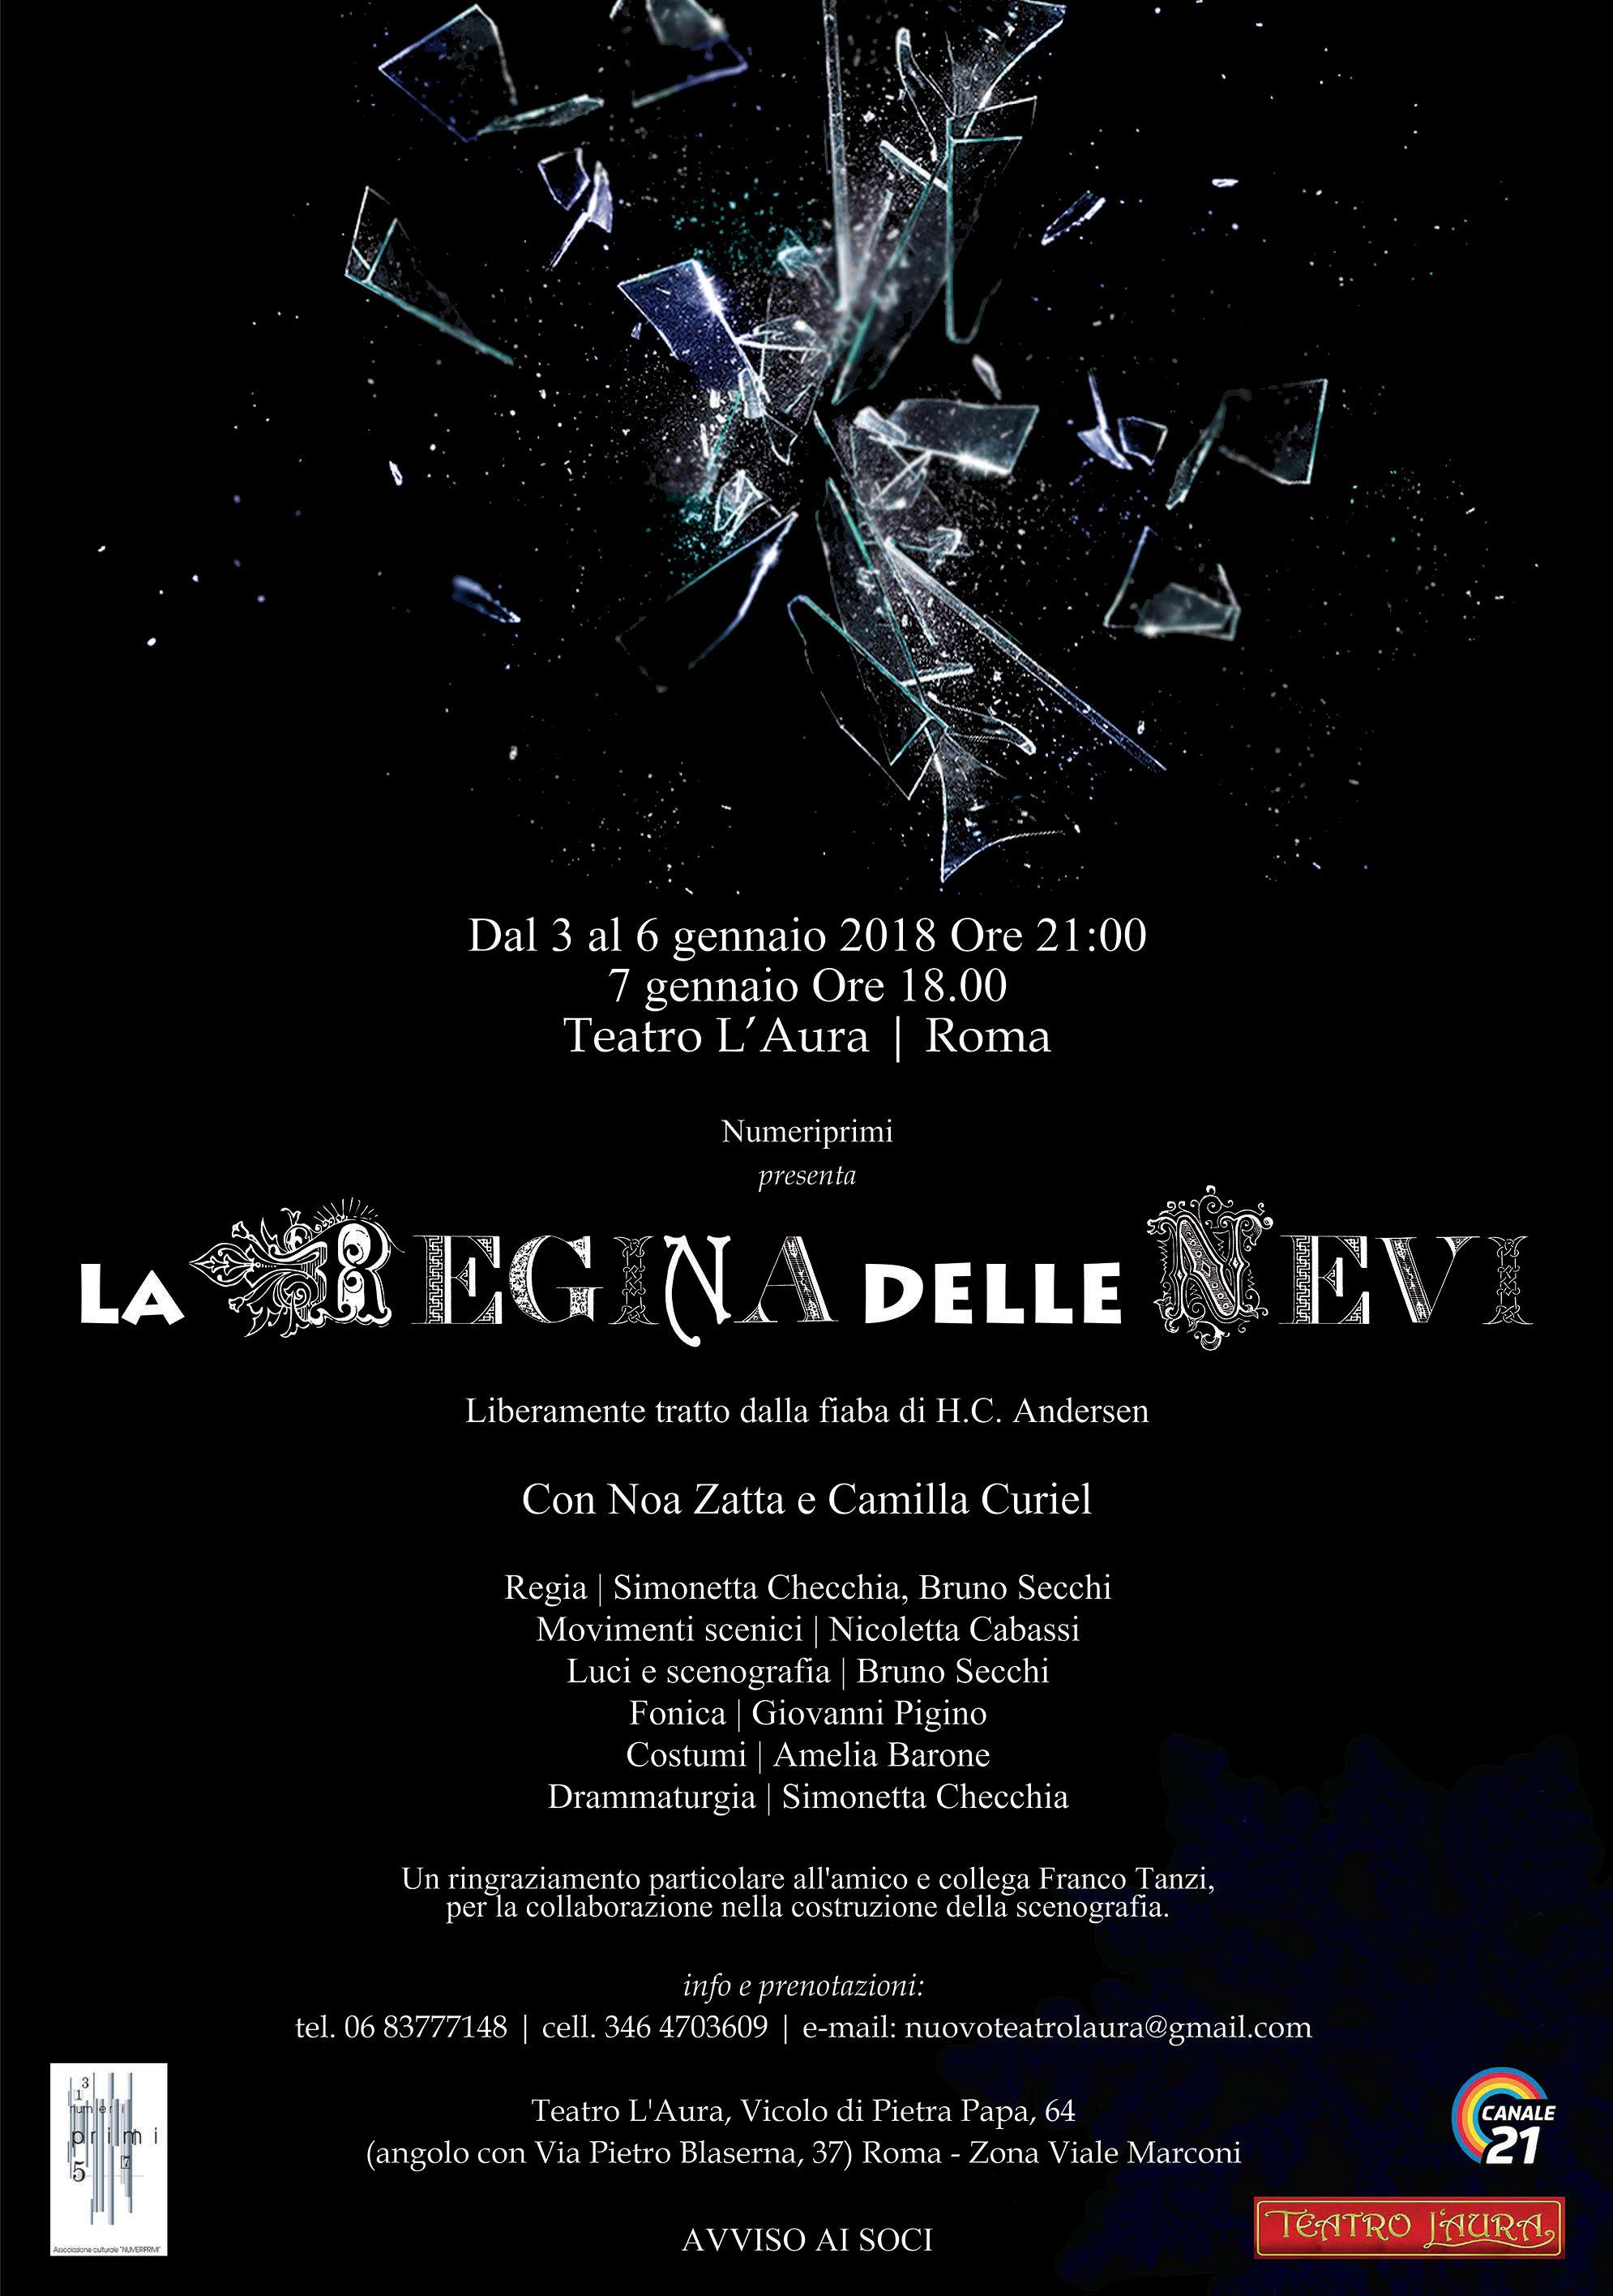 LA REGINA DELLE NEVI al Teatro L'Aura dal 3 al 7 gennaio 2018